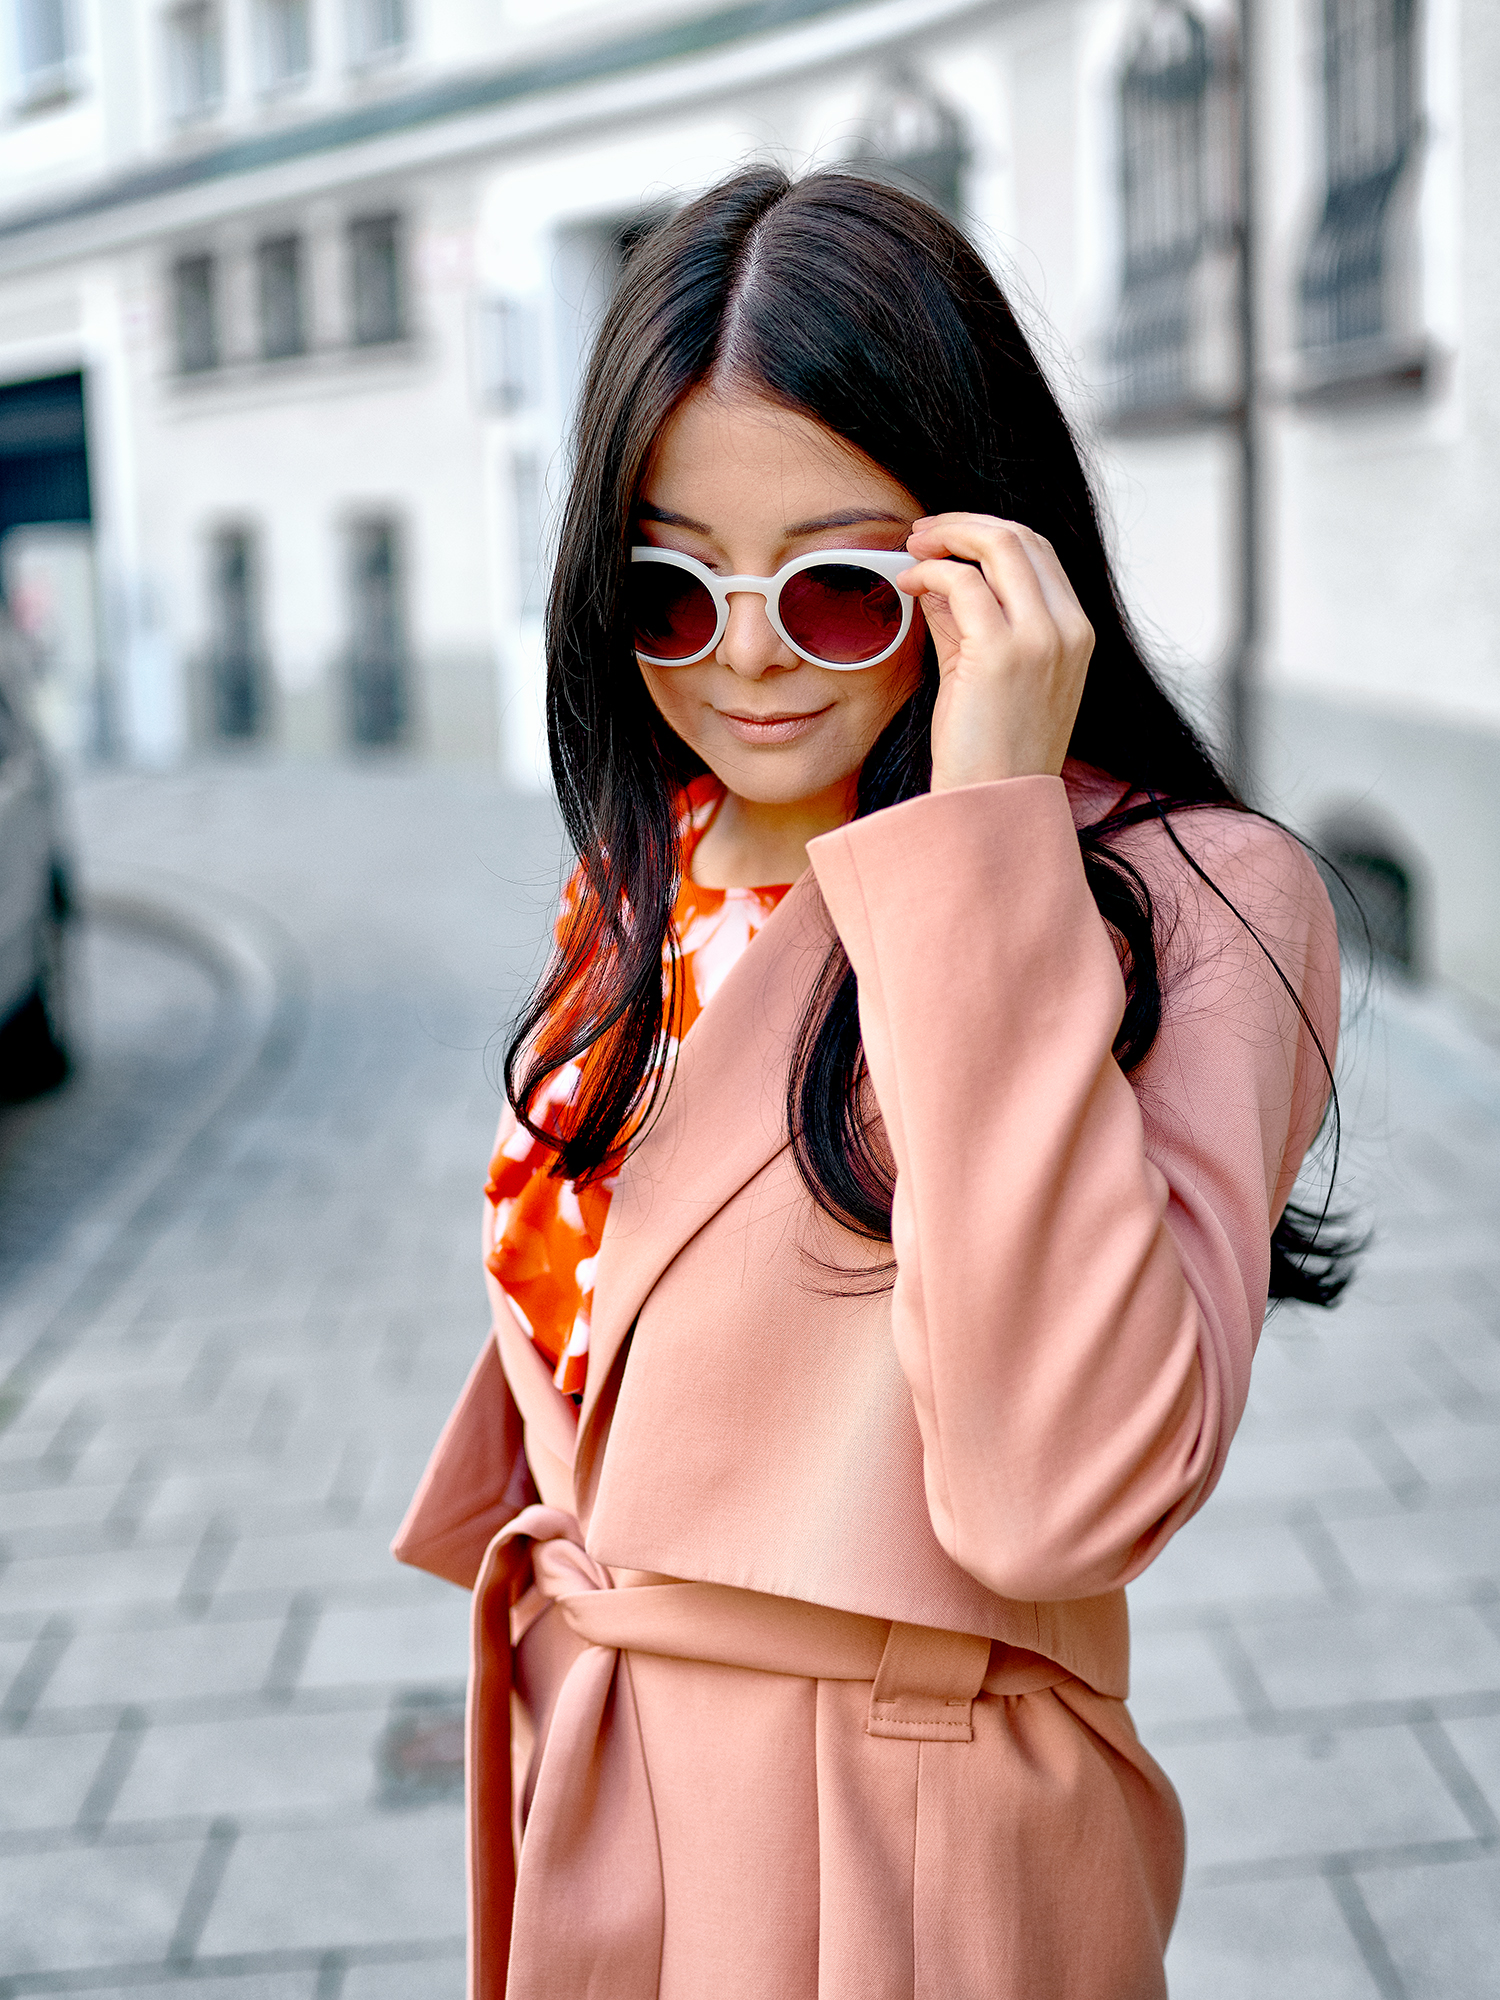 fashionambit-fashionblog-muenchen-modeblog-deutschland-blogger-modeblogger-fashionblogger-bloggerdeutschland-lifestyleblog-munich-style-blog-trend-farben